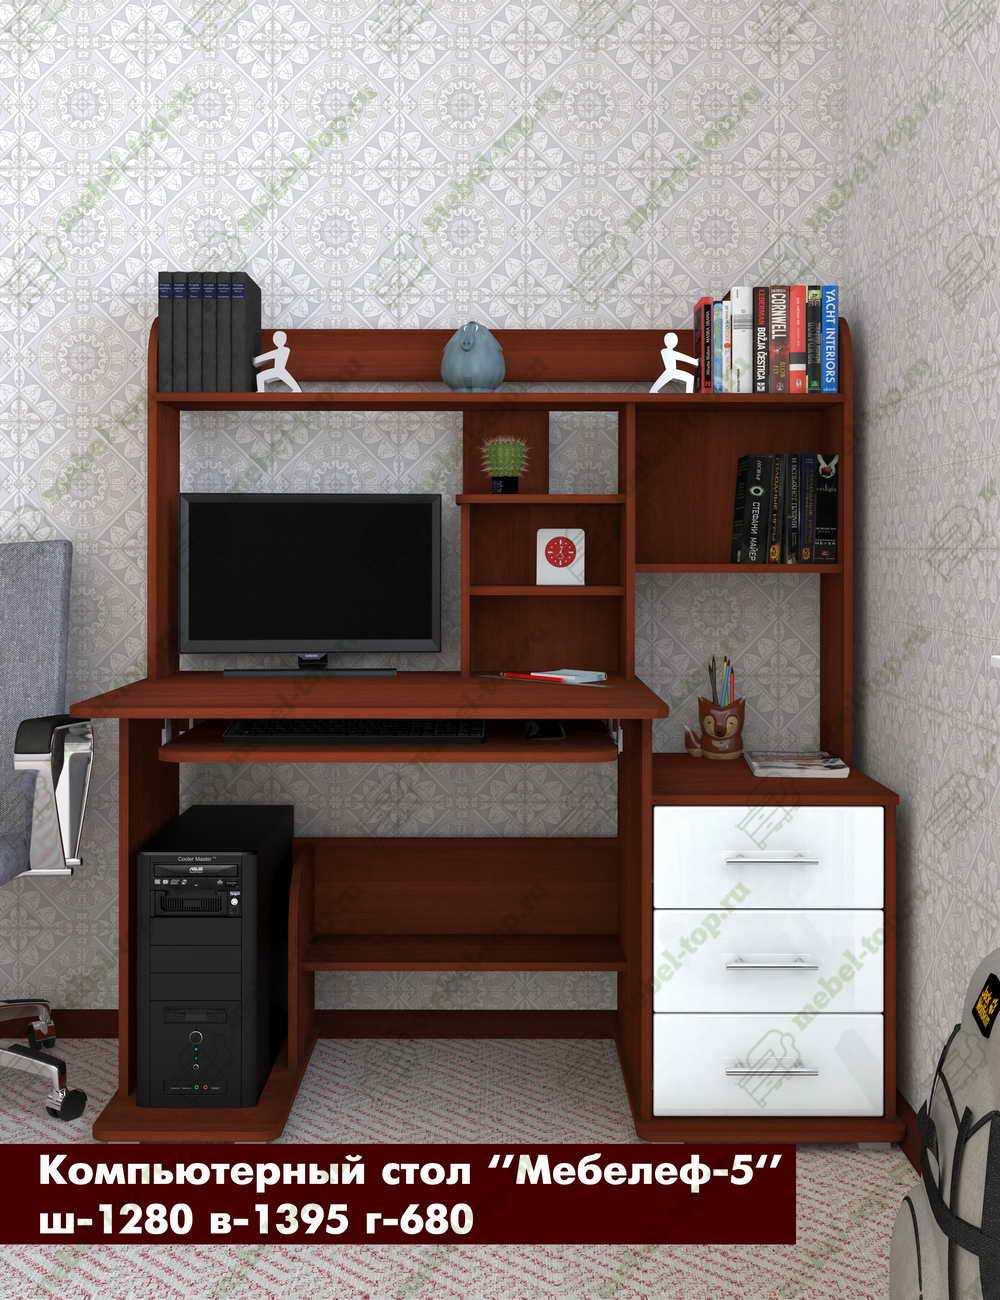 Компьютерный стол Мебелеф-5 стенка мебелеф 5